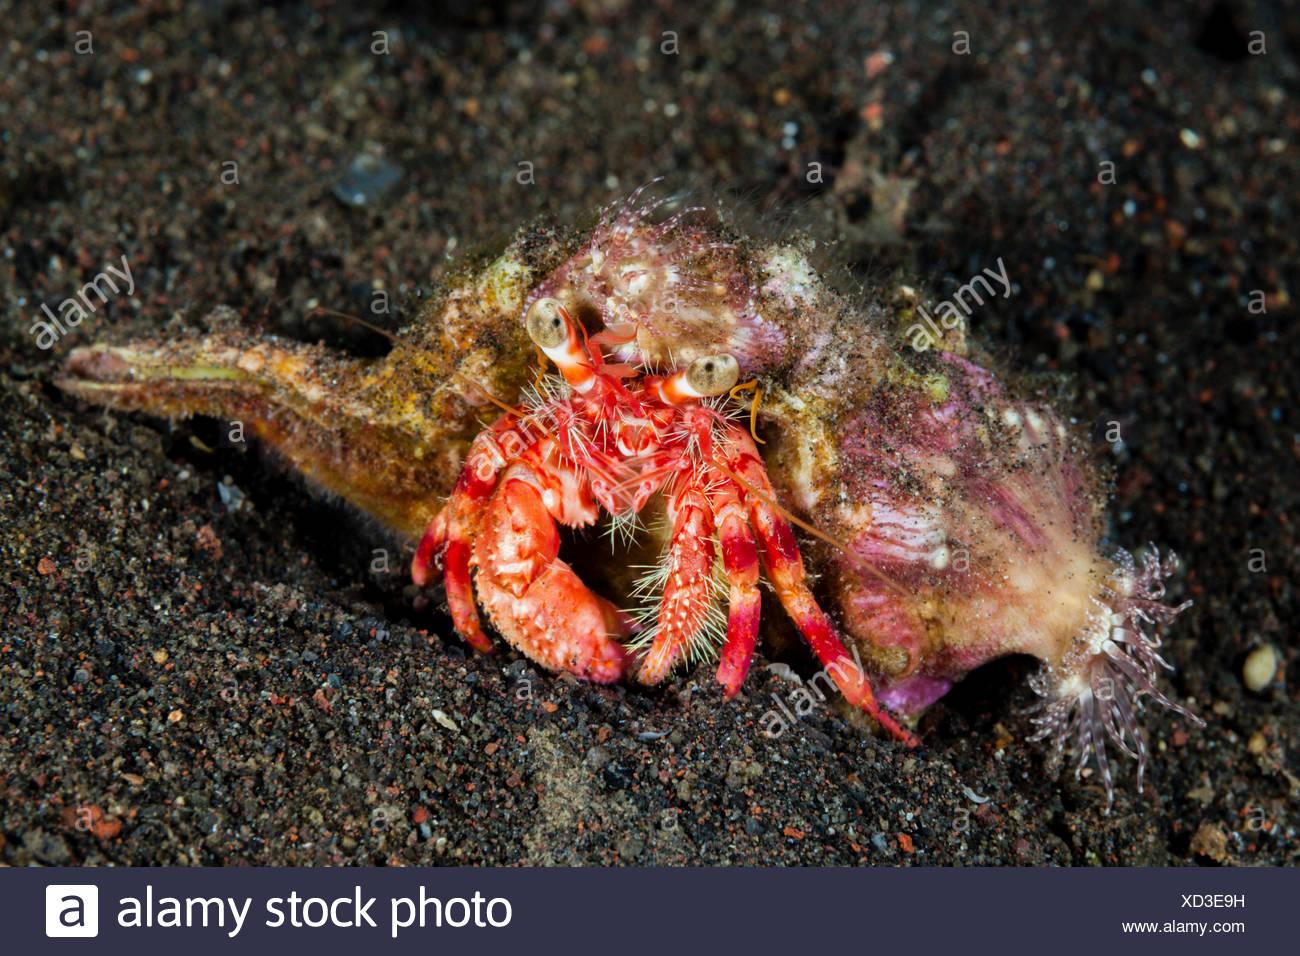 Anemone Hermit Crab, Dardanus pedunculatus, Bali, Indonesia - Stock Image